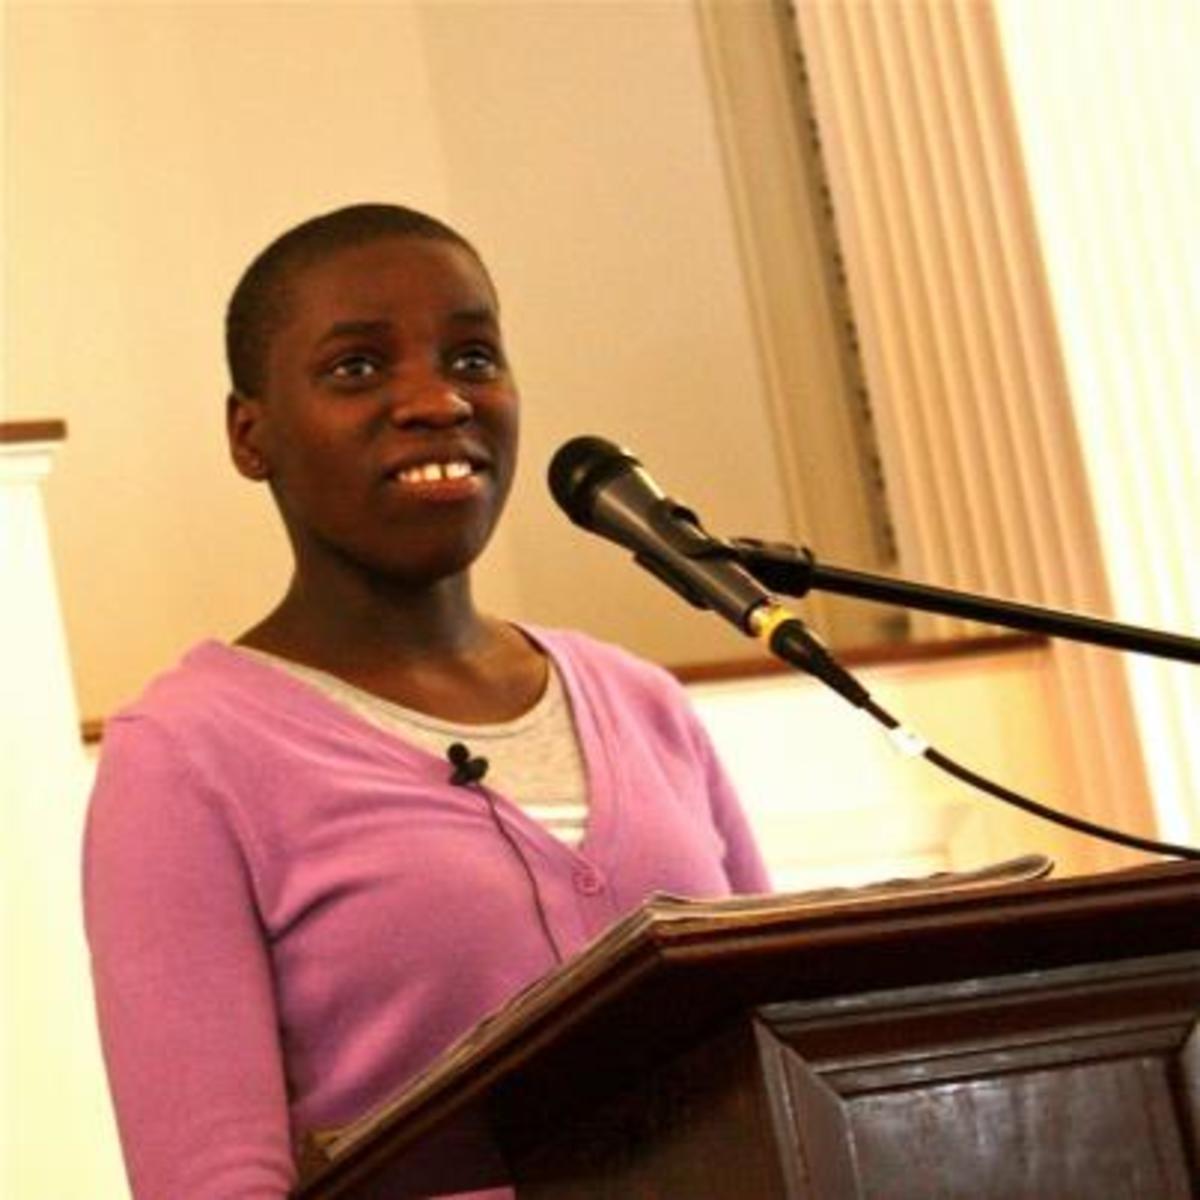 Phiona Mutesi in the United States